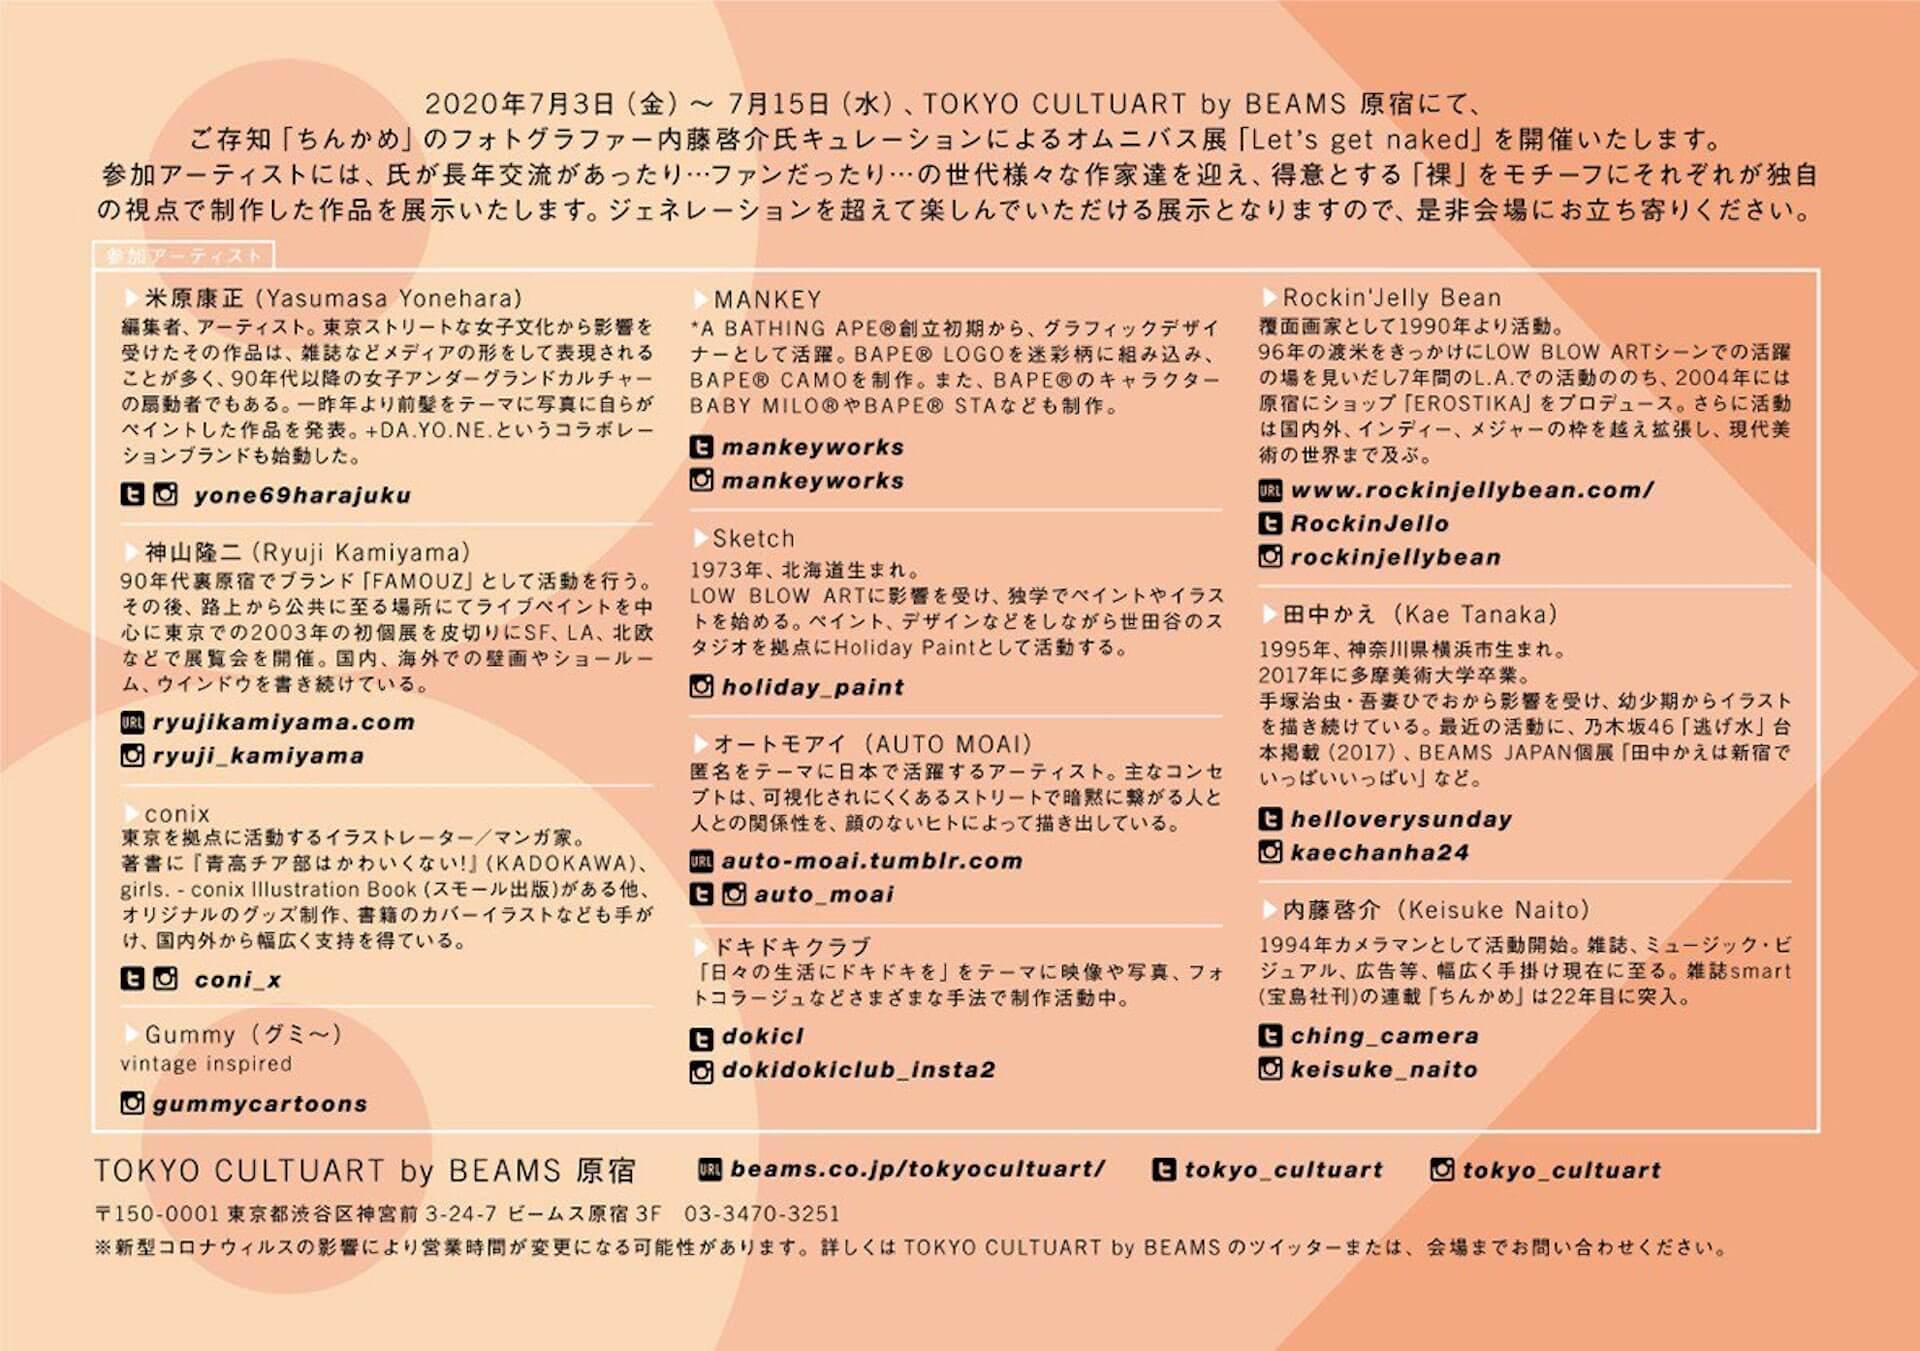 MANKEY&SEX YamaguchiによるMIX CD『S.E.X.M.A.N.』にキケンなウワサ──『ちんかめ』内藤啓介キュレートの展示<Let's get naked>が開催中 music200703-letsgetnaked-mankey-sexyamaguchi-2